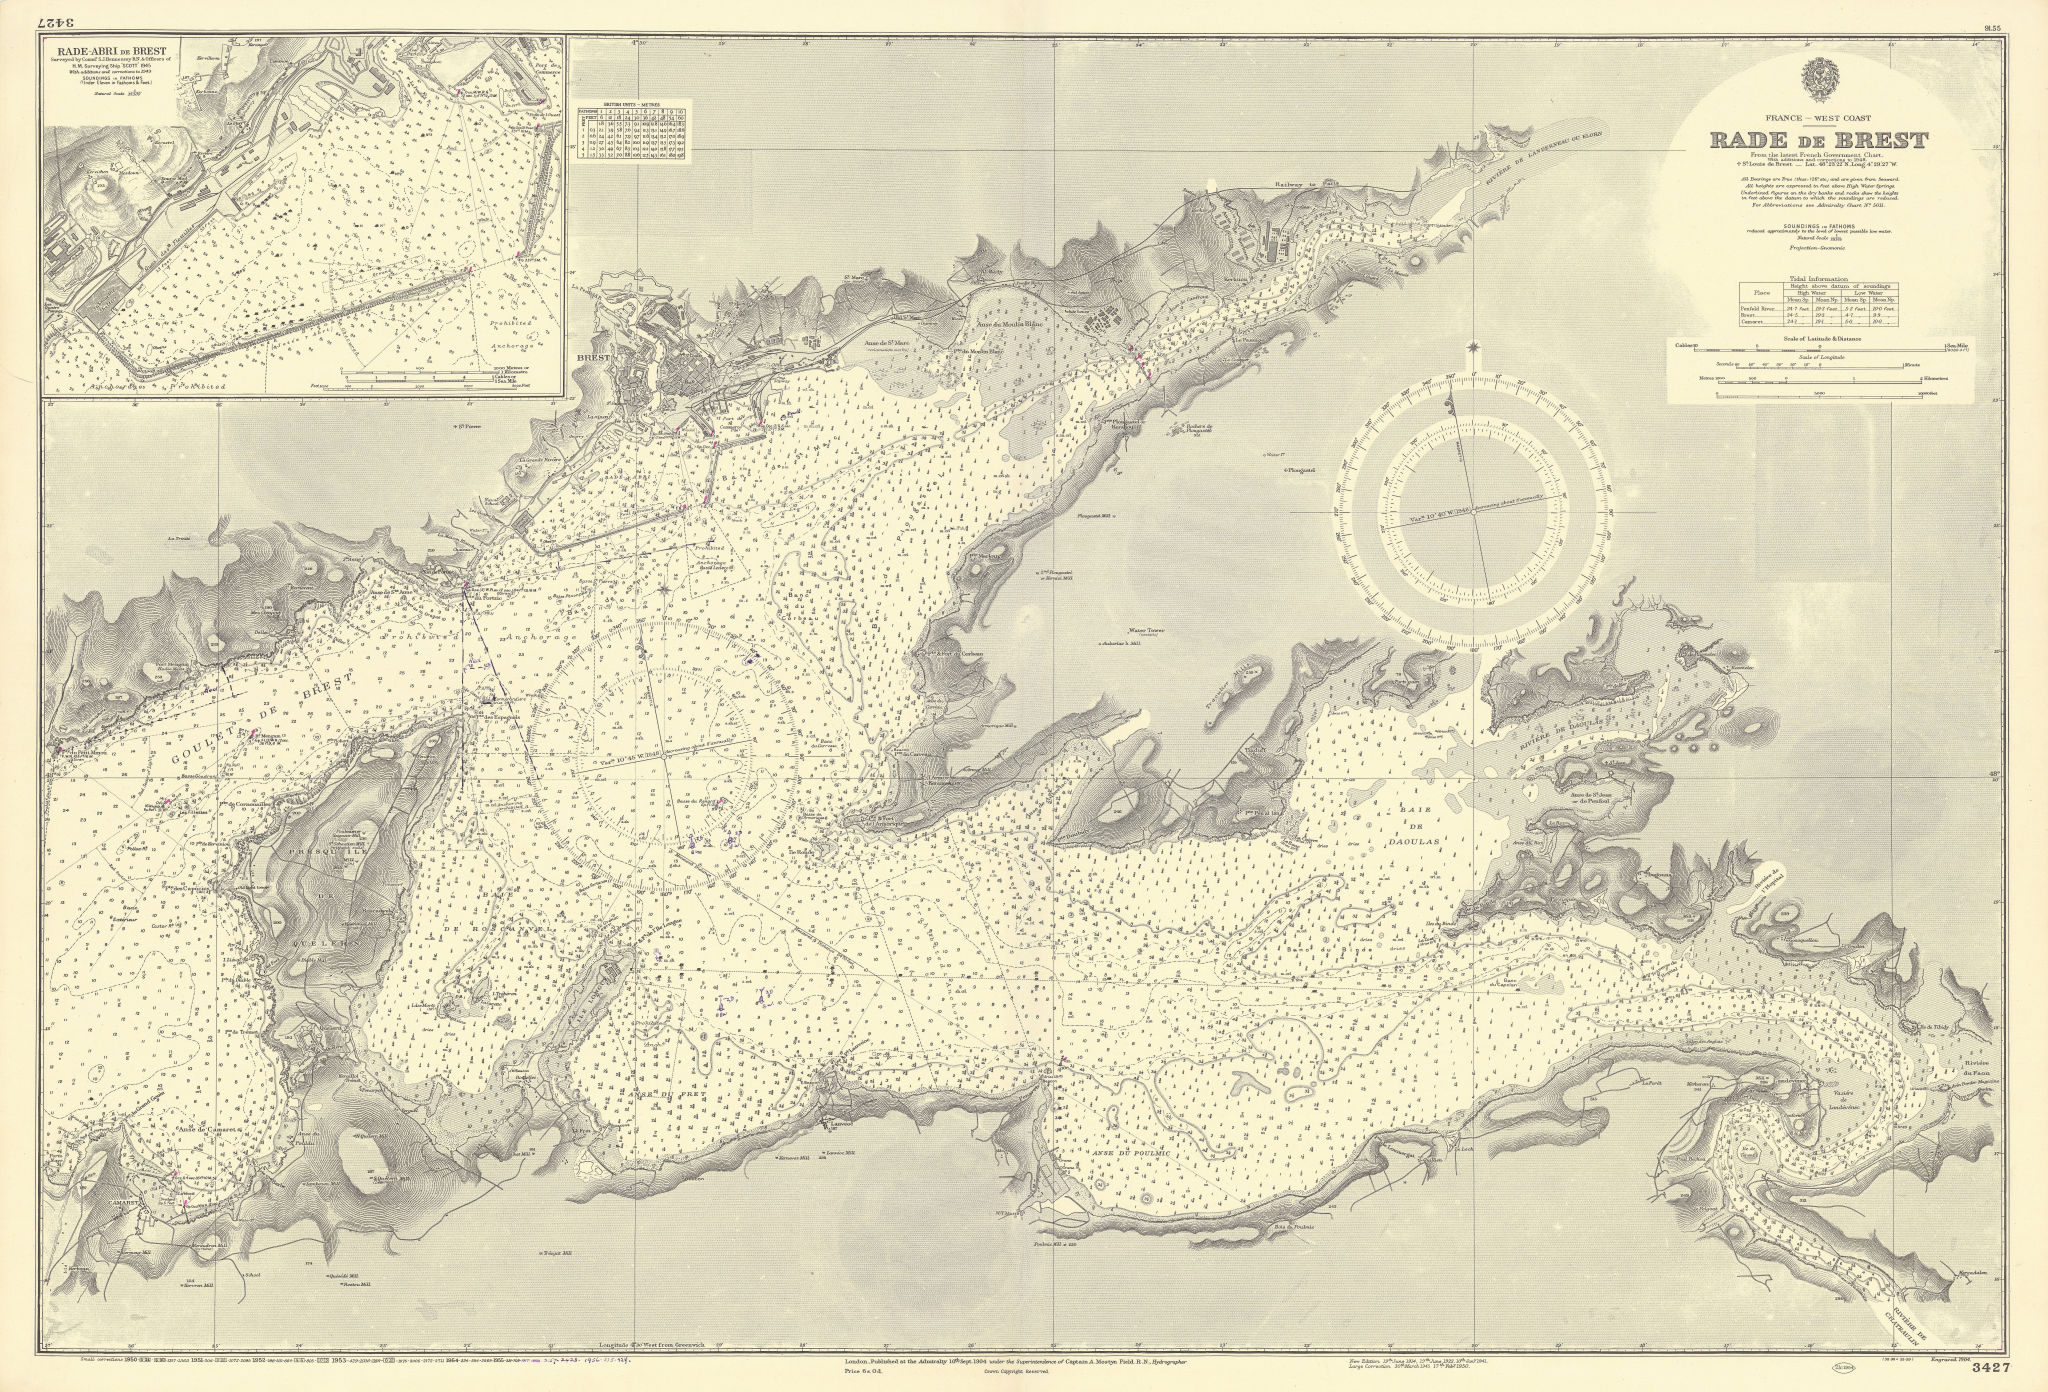 Brest Rade & Rade-Abri. Finistère, Brittany. ADMIRALTY sea chart 1904 (1956) map